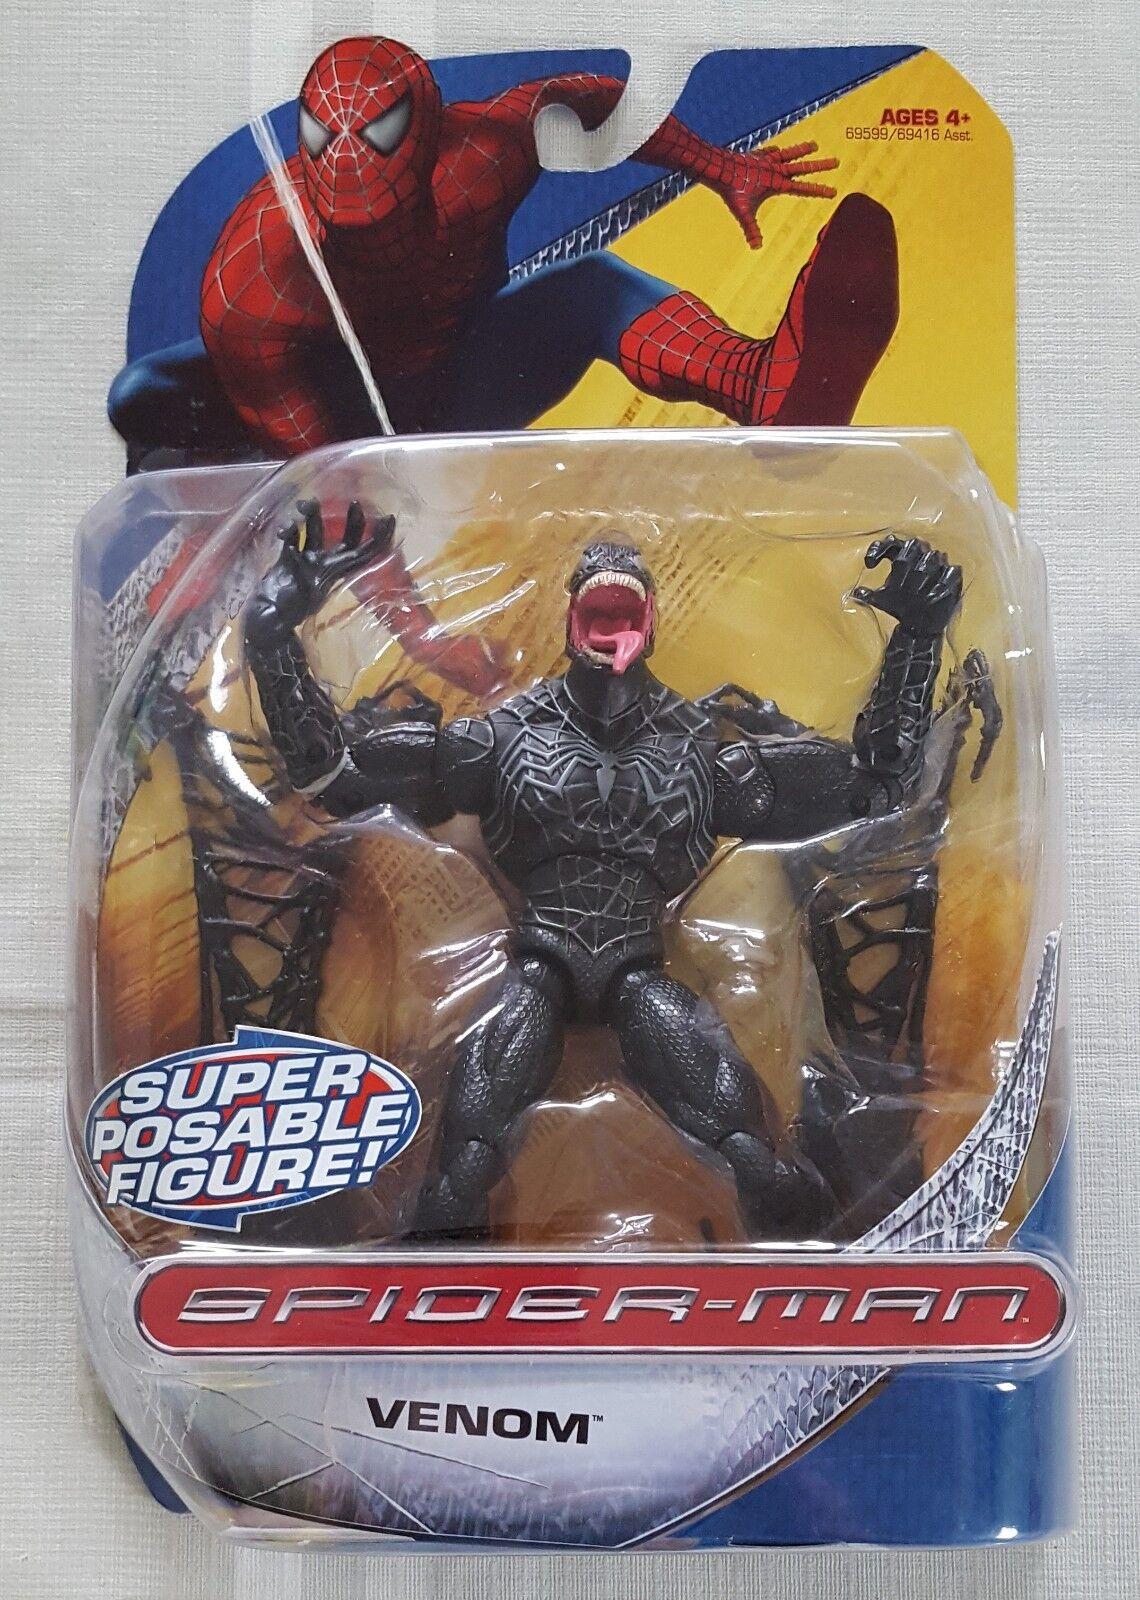 Marvel - legenden spiderman - klassiker - trilogie gift action - figur - hasbro 2007